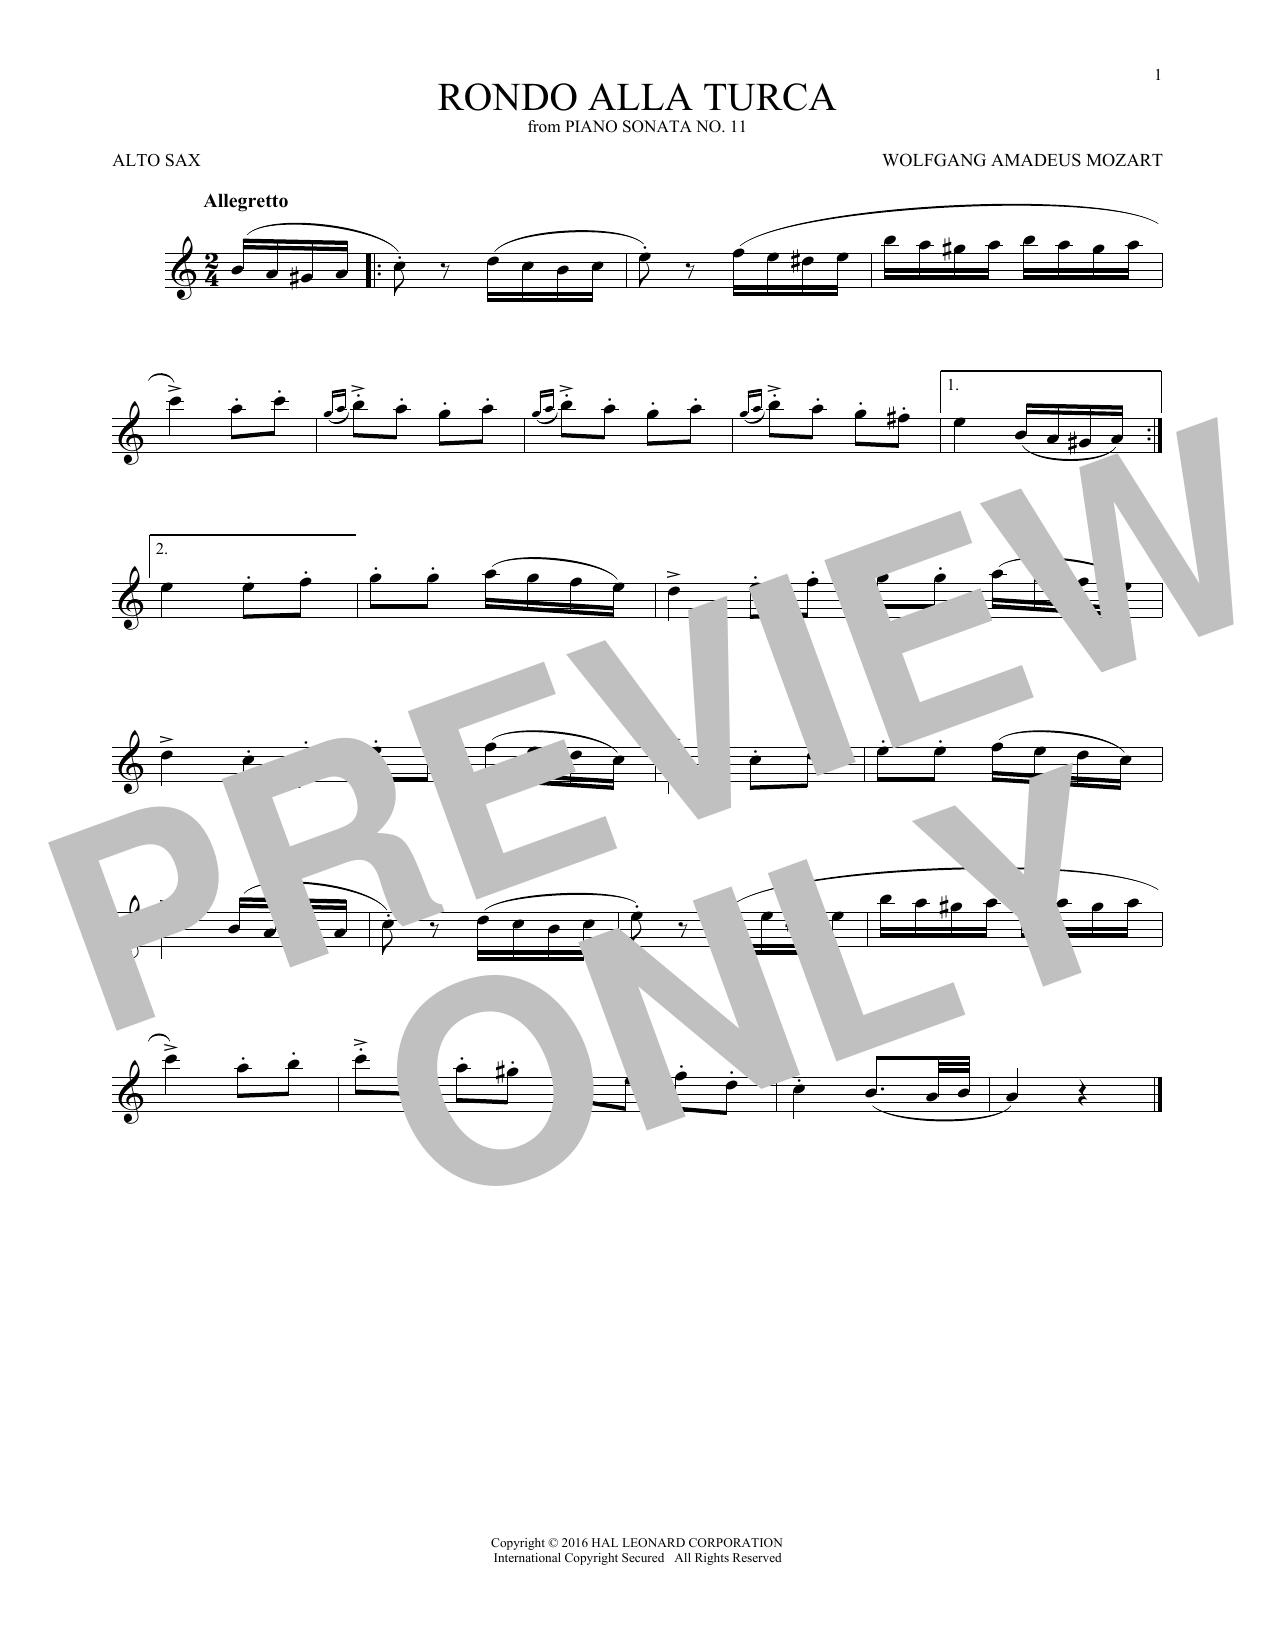 Wolfgang Amadeus Mozart Rondo Alla Turca sheet music notes and chords. Download Printable PDF.